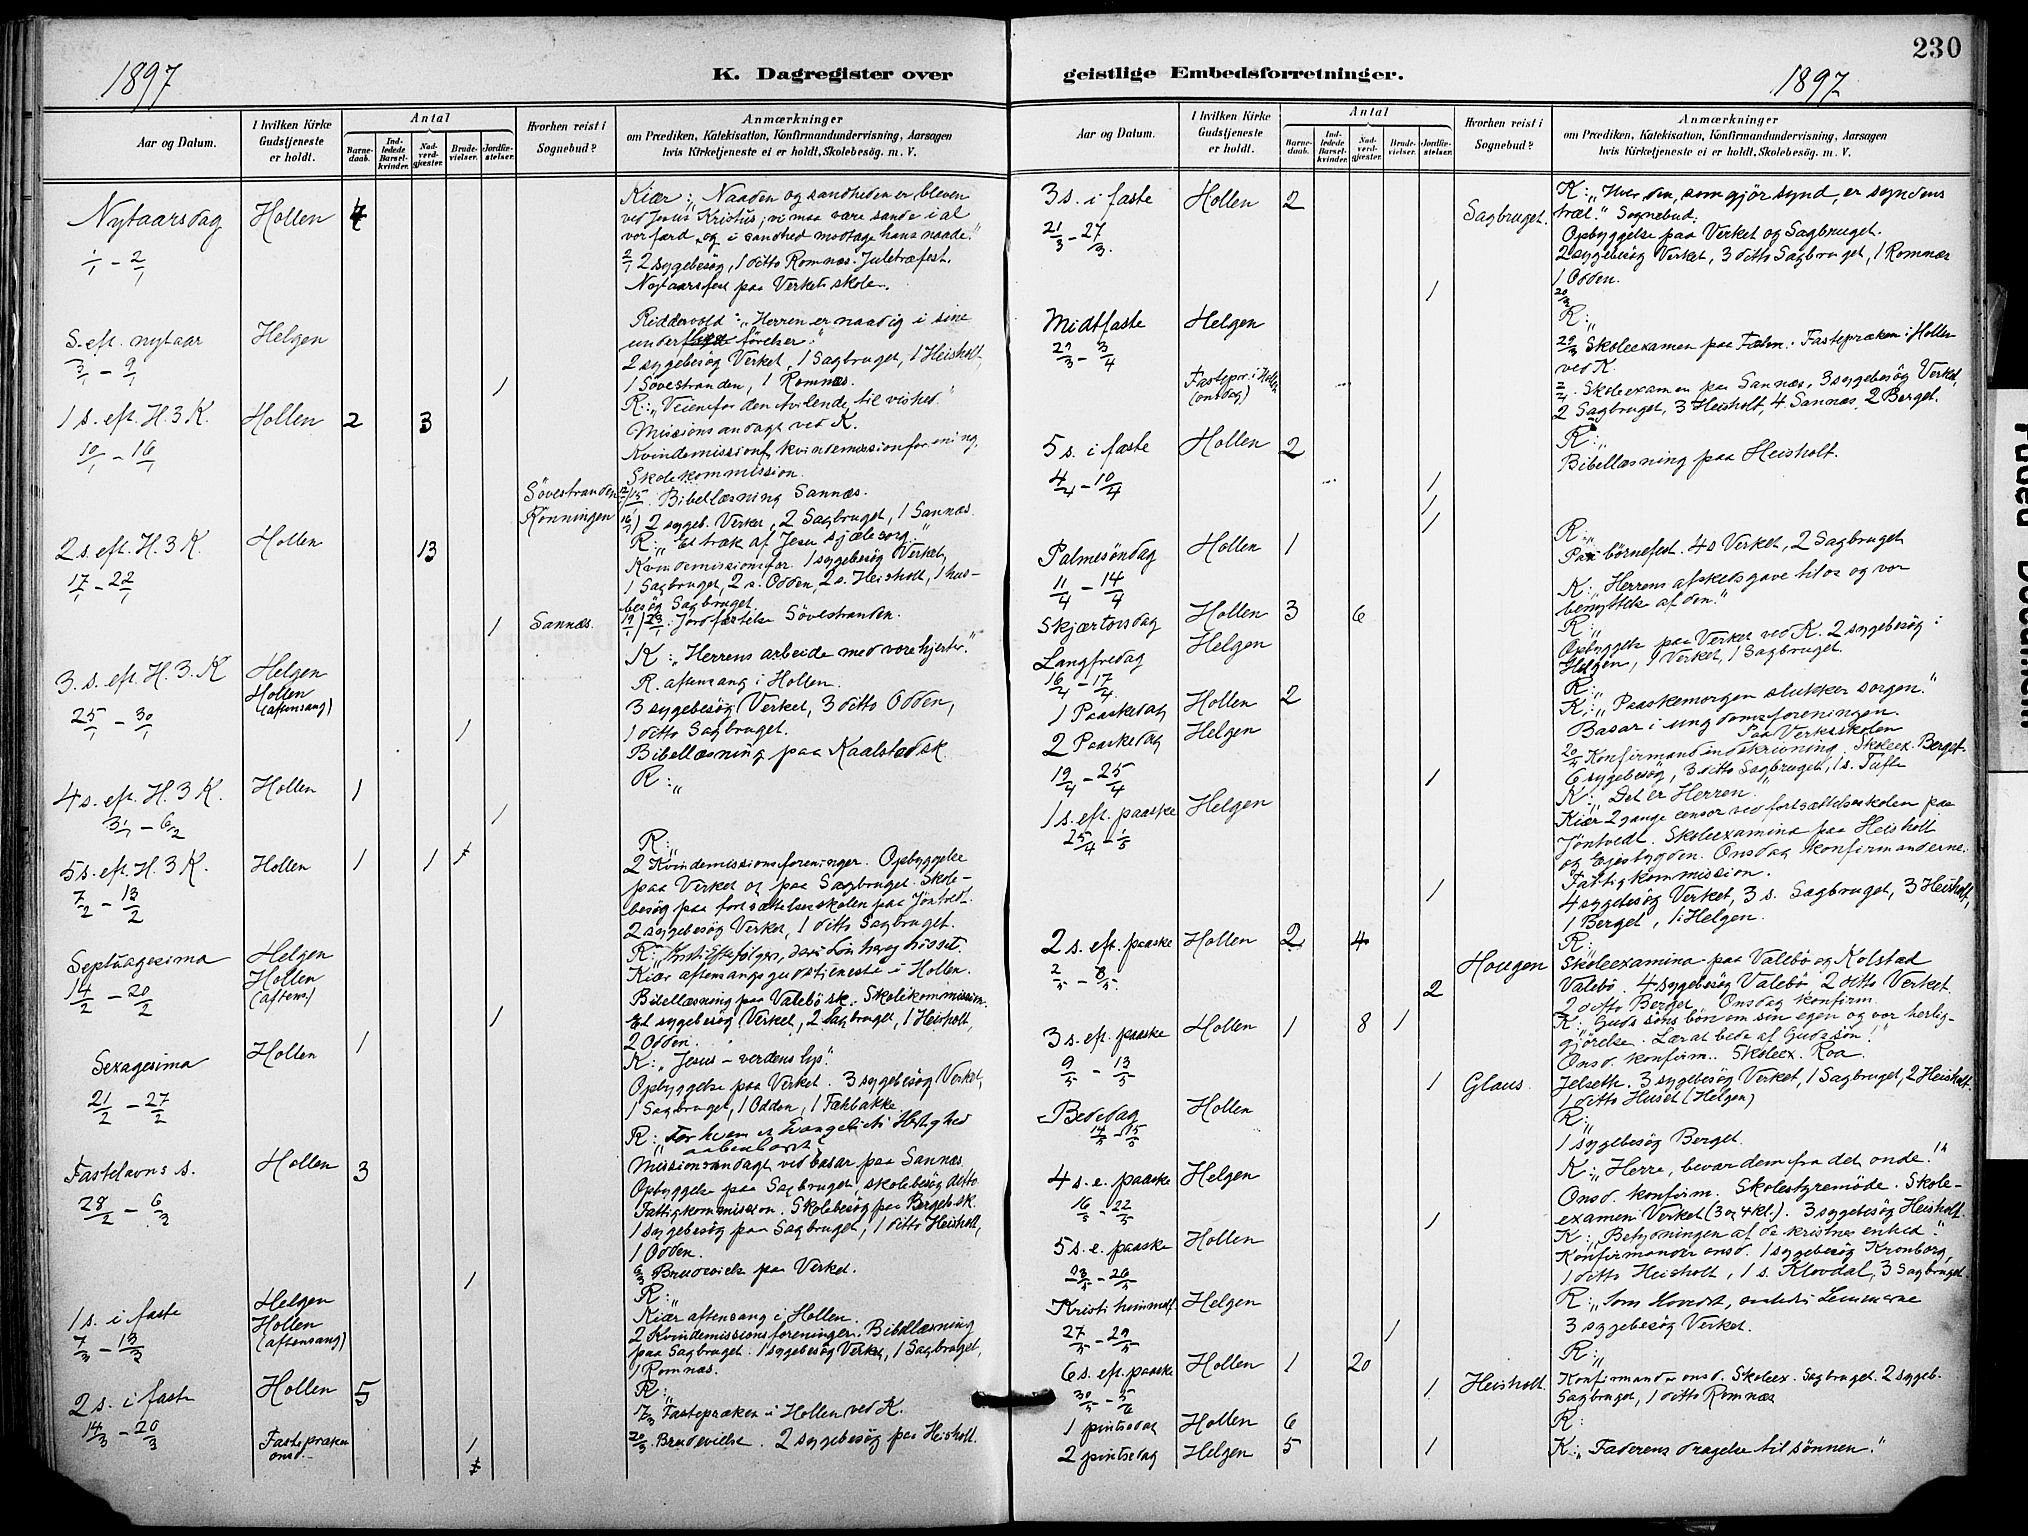 SAKO, Holla kirkebøker, F/Fa/L0010: Ministerialbok nr. 10, 1897-1907, s. 230